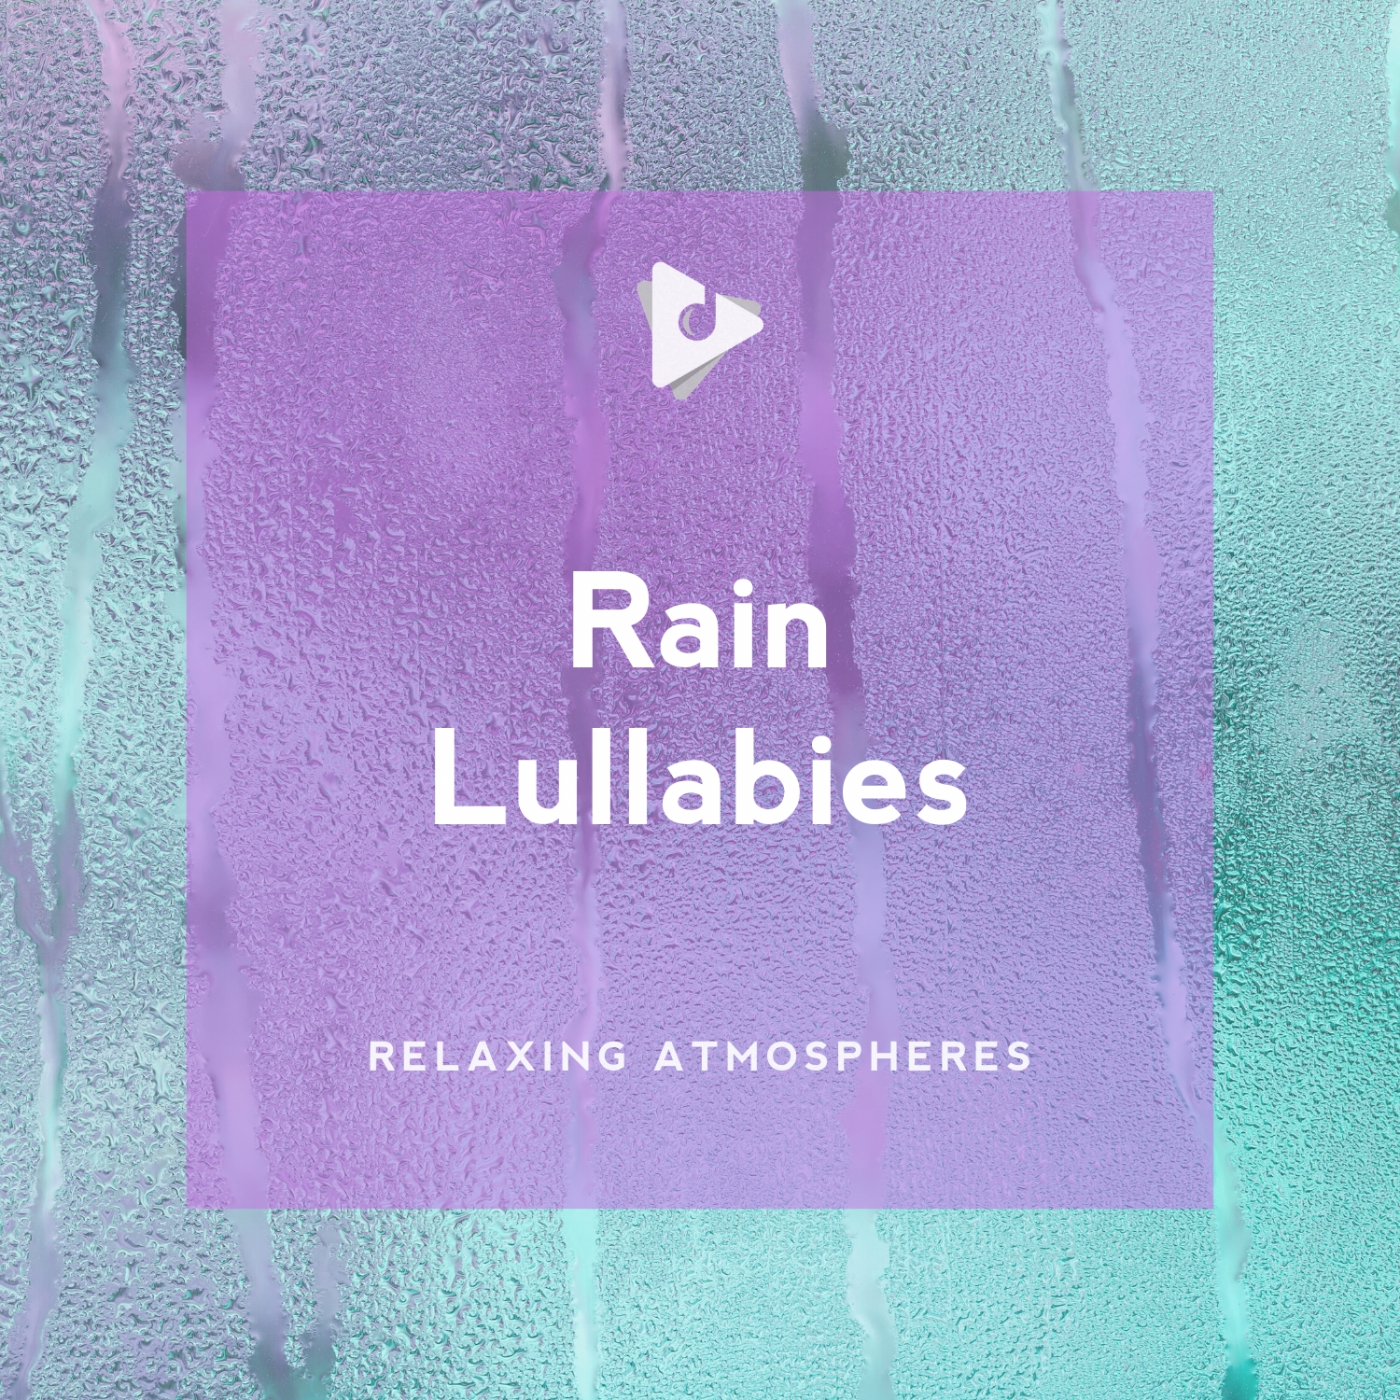 Rain Lullabies